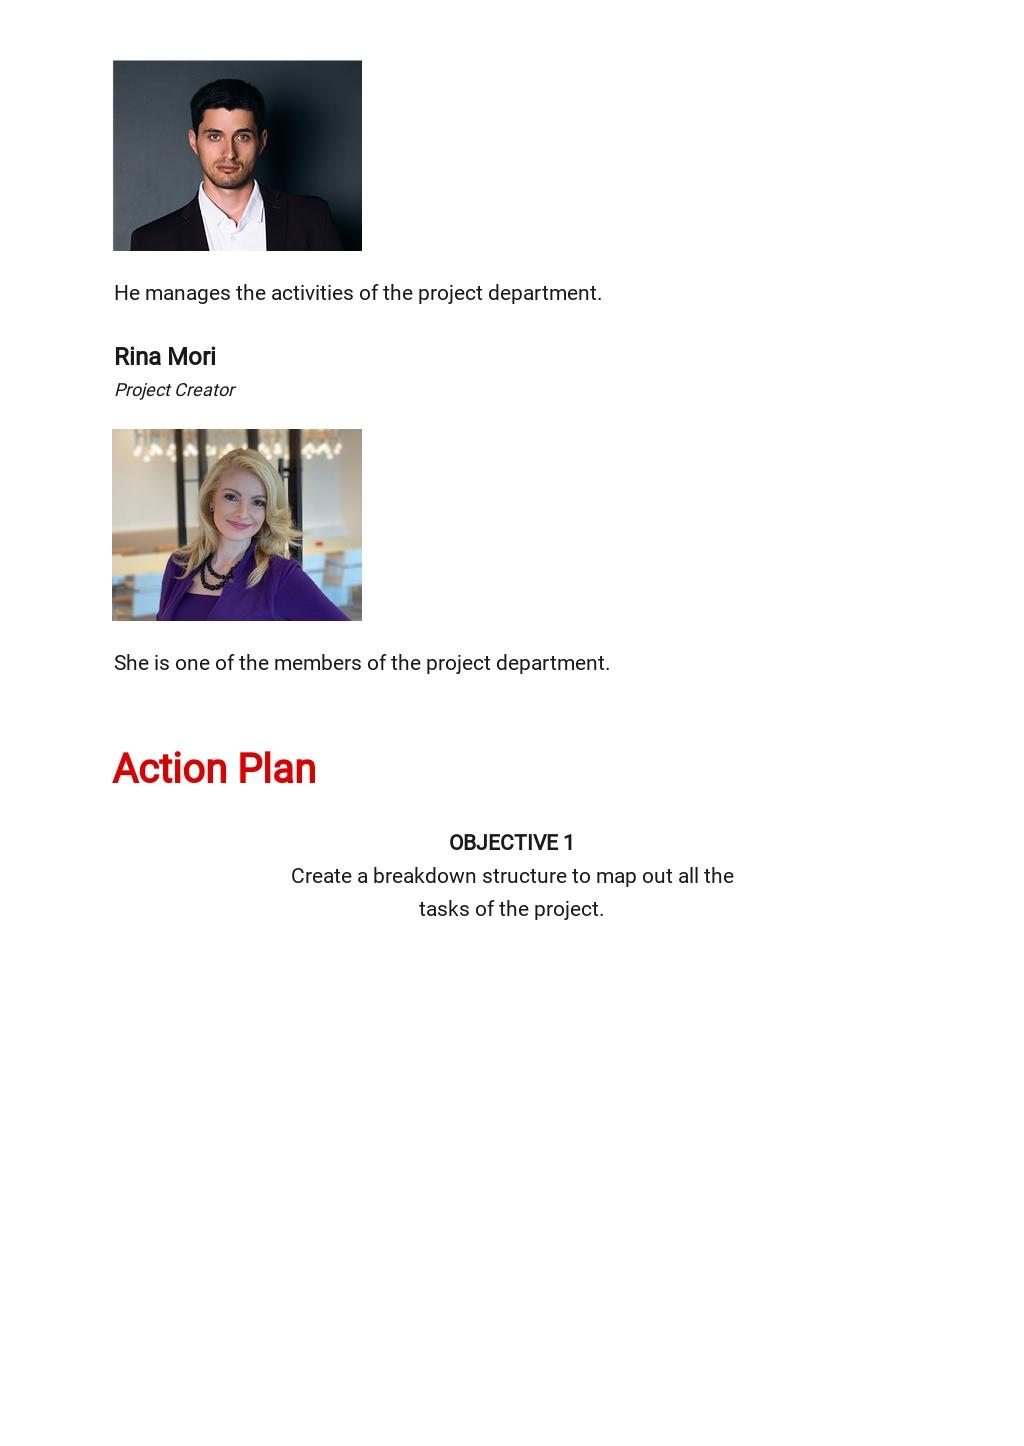 Scope Management Plan Template [Free PDF] - Google Docs, Word